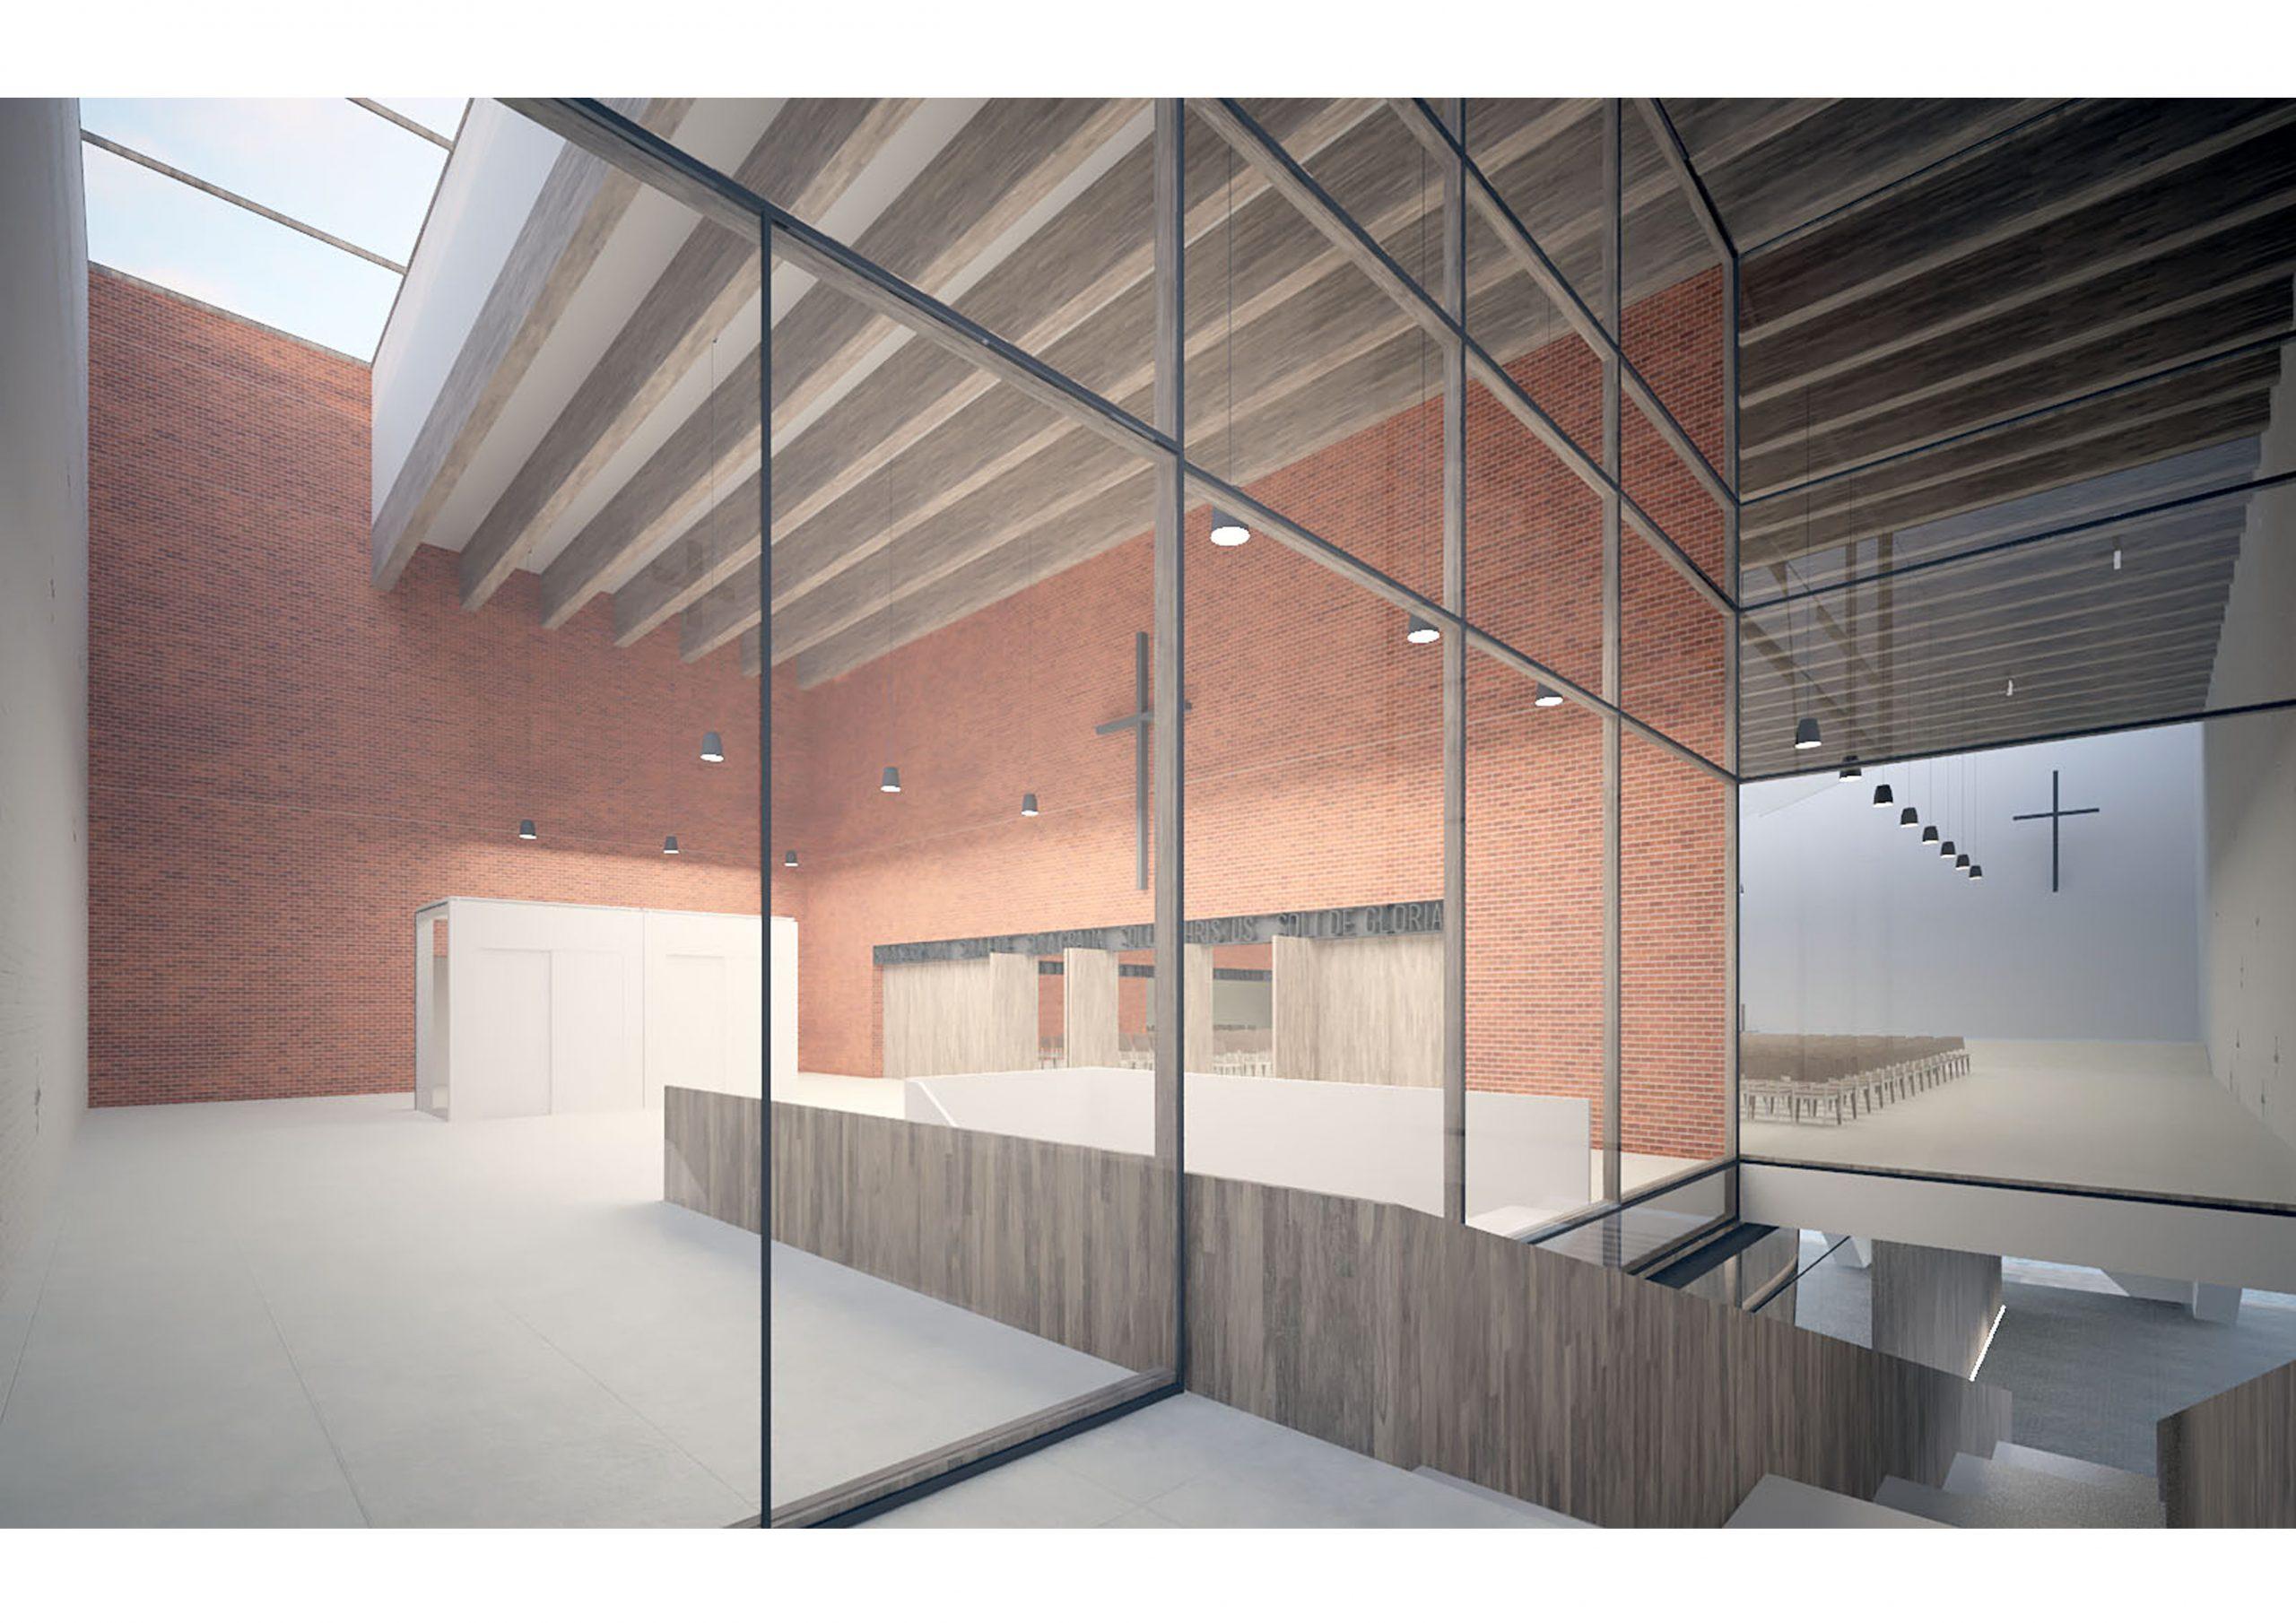 https://nbc-arhitect.ro/wp-content/uploads/2020/10/NBC-Arhitect-_-public-buildings-_-Protestant-Church-_-Copenhagen-_-interior-view_3-scaled.jpg